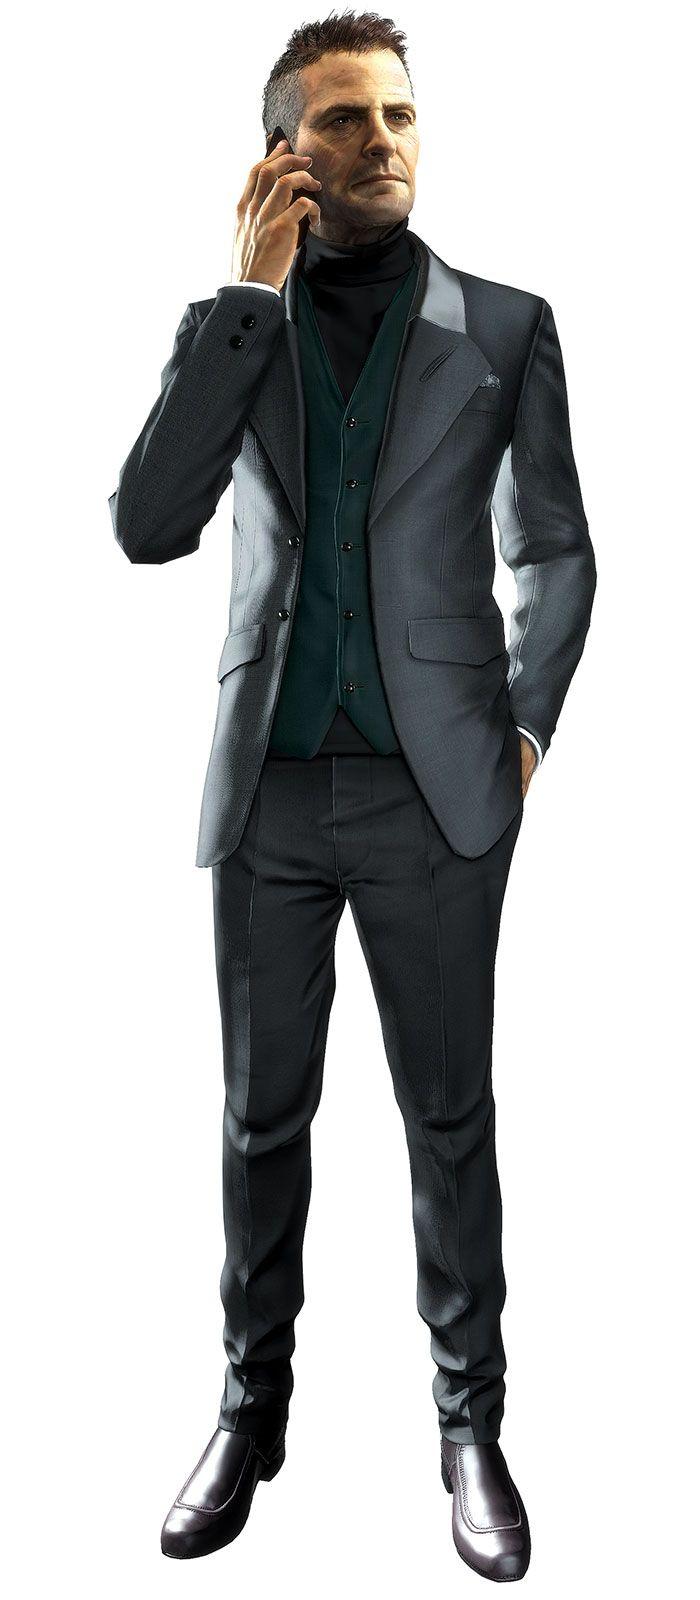 Jim Miller - Characters & Art - Deus Ex: Mankind Divided